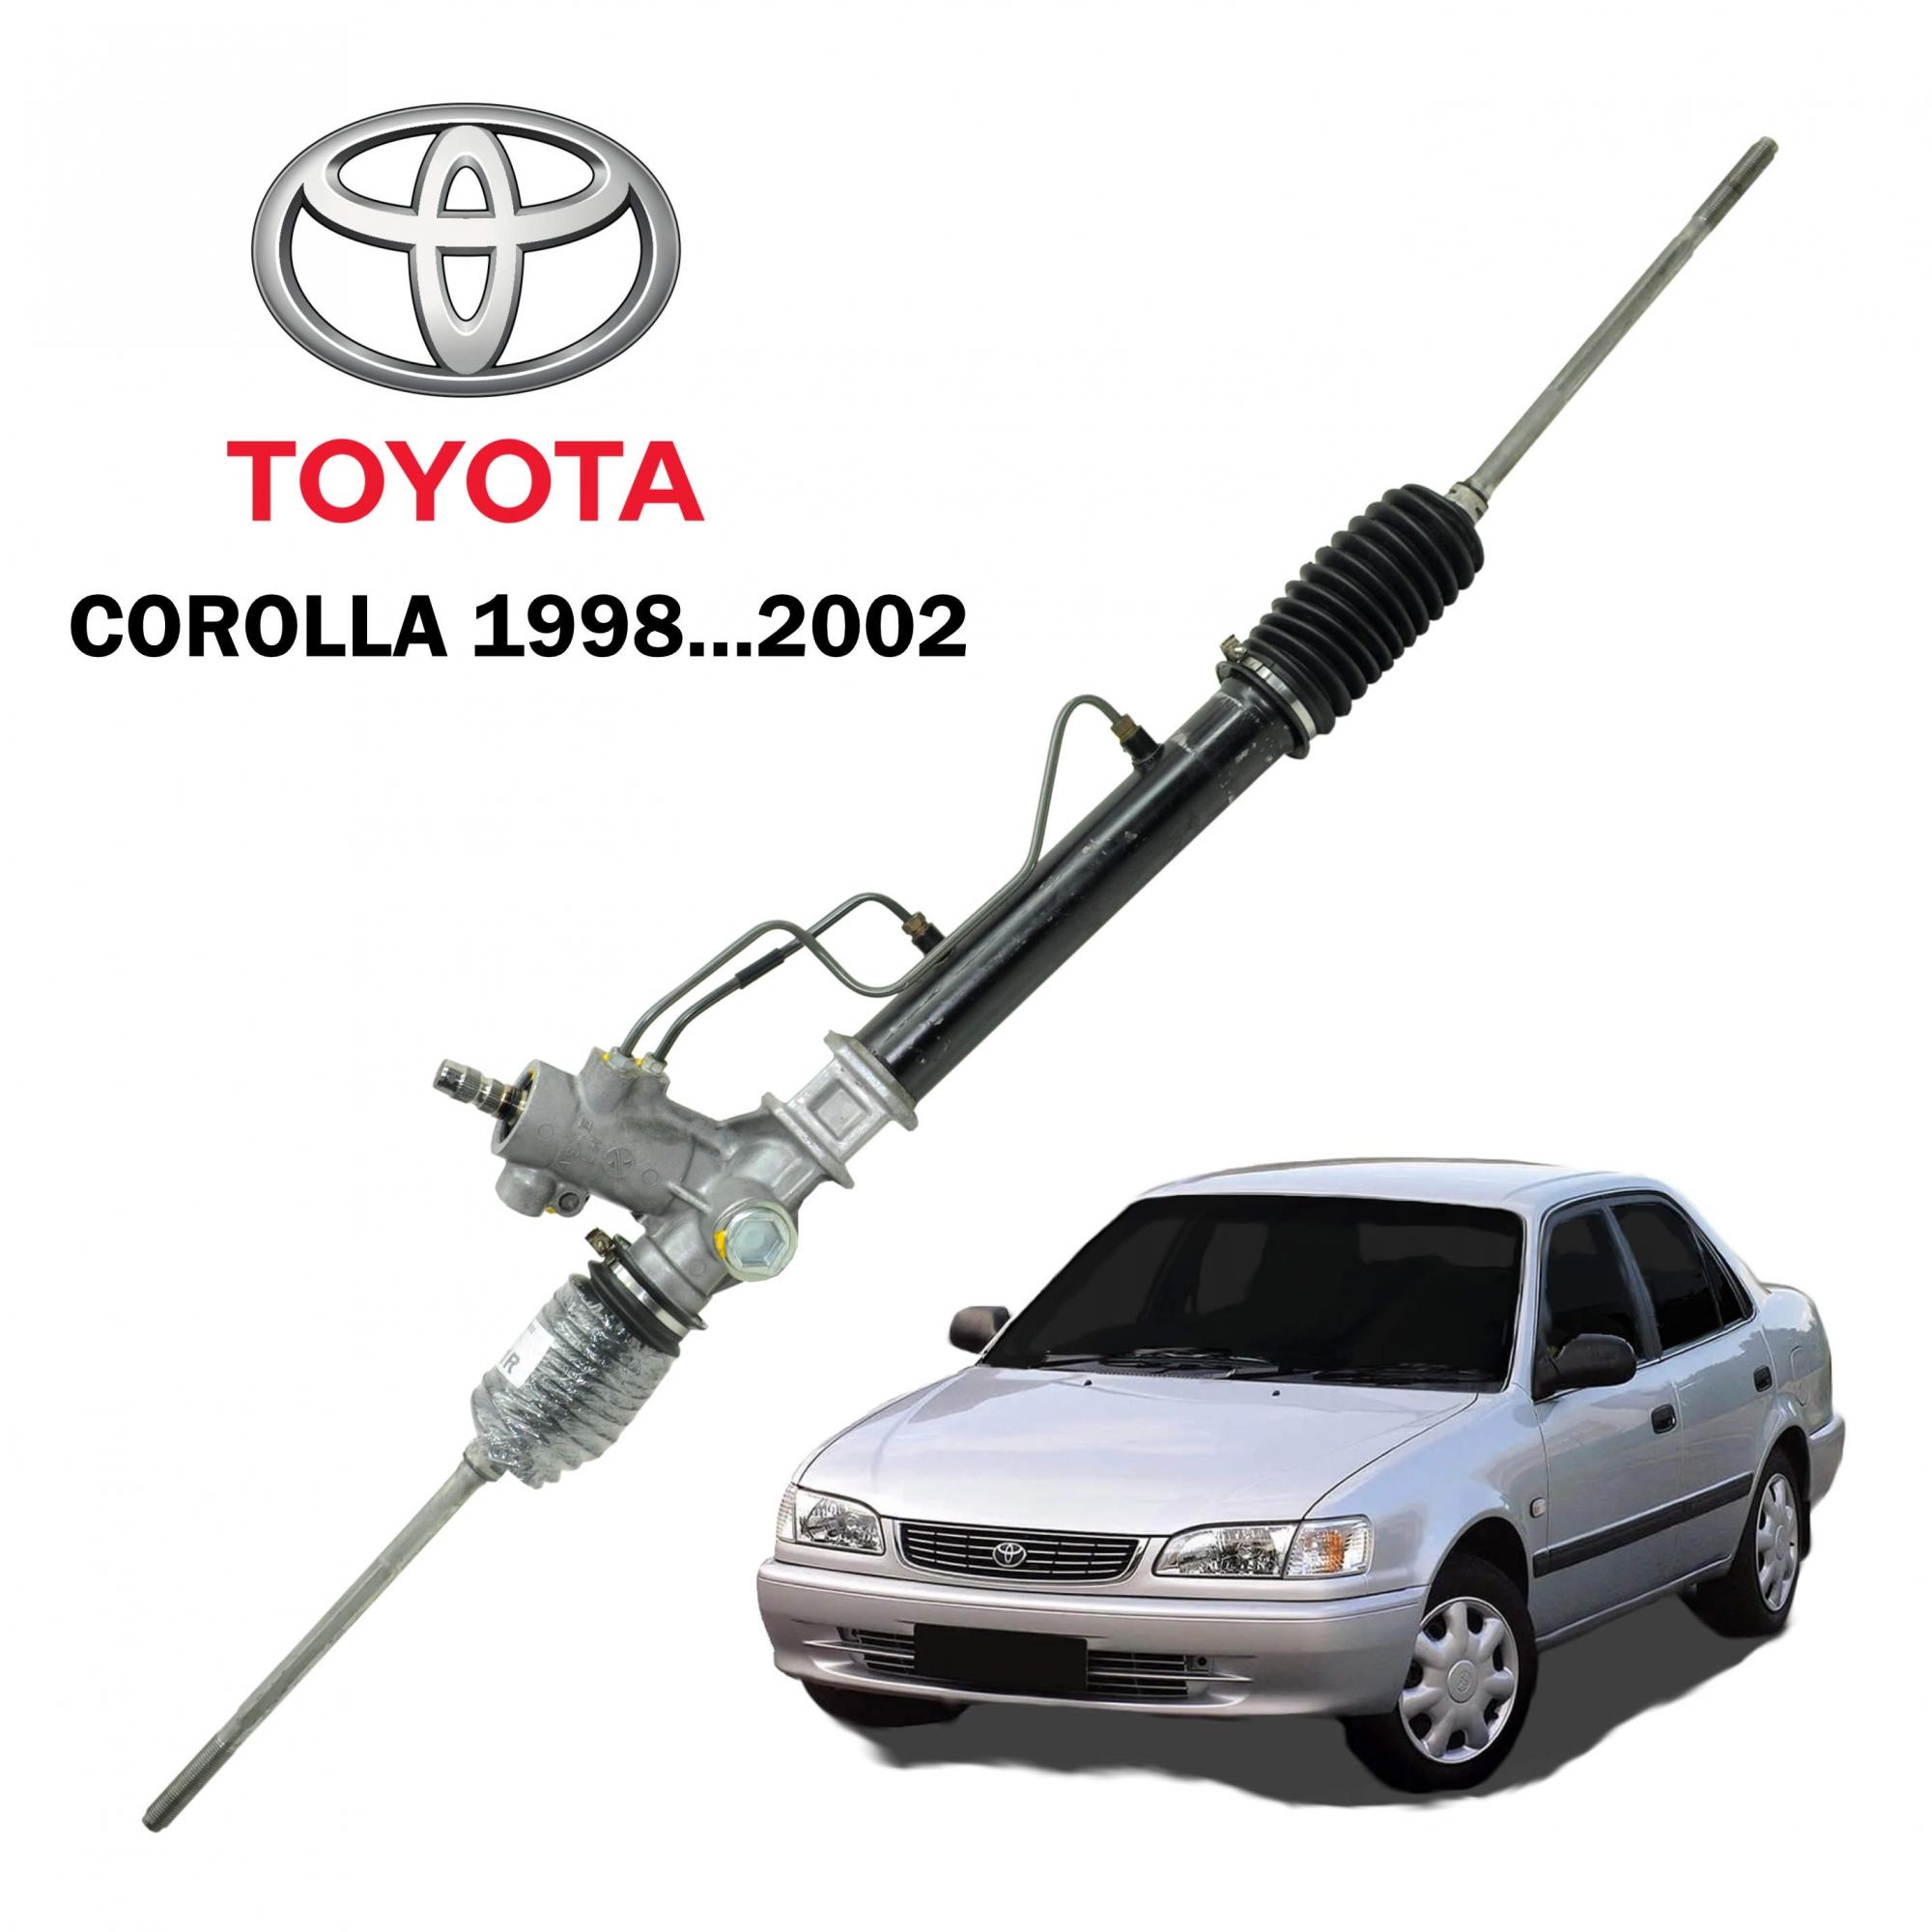 Caixa Direção Hidráulica KOYO/JTEKT Toyota Corolla 98...02